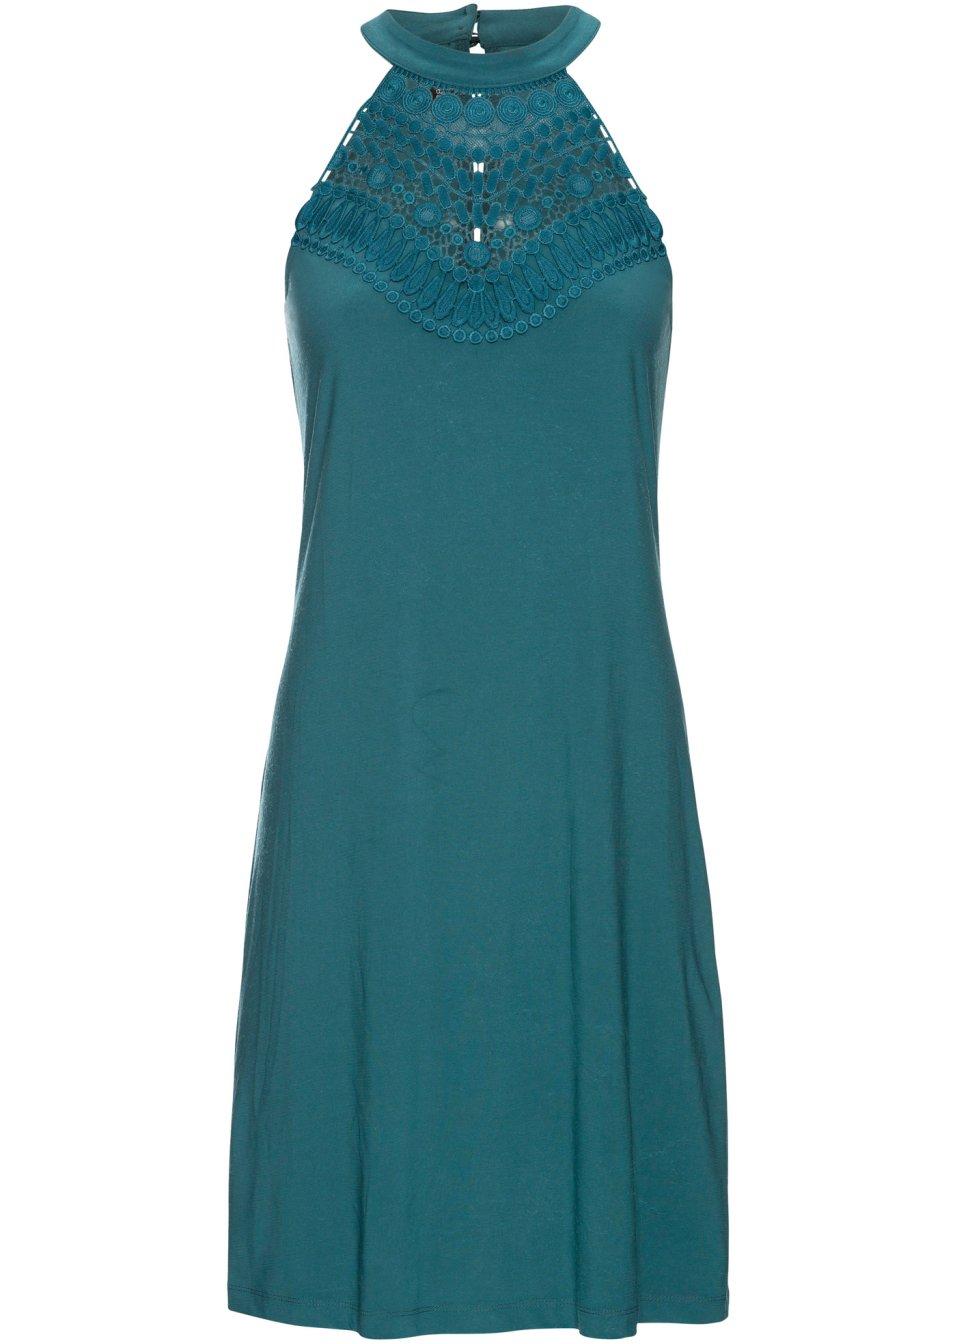 Kleid mit Spitze mattpetrol - Damen - BODYFLIRT - bonprix.de OLsDA VwVBz